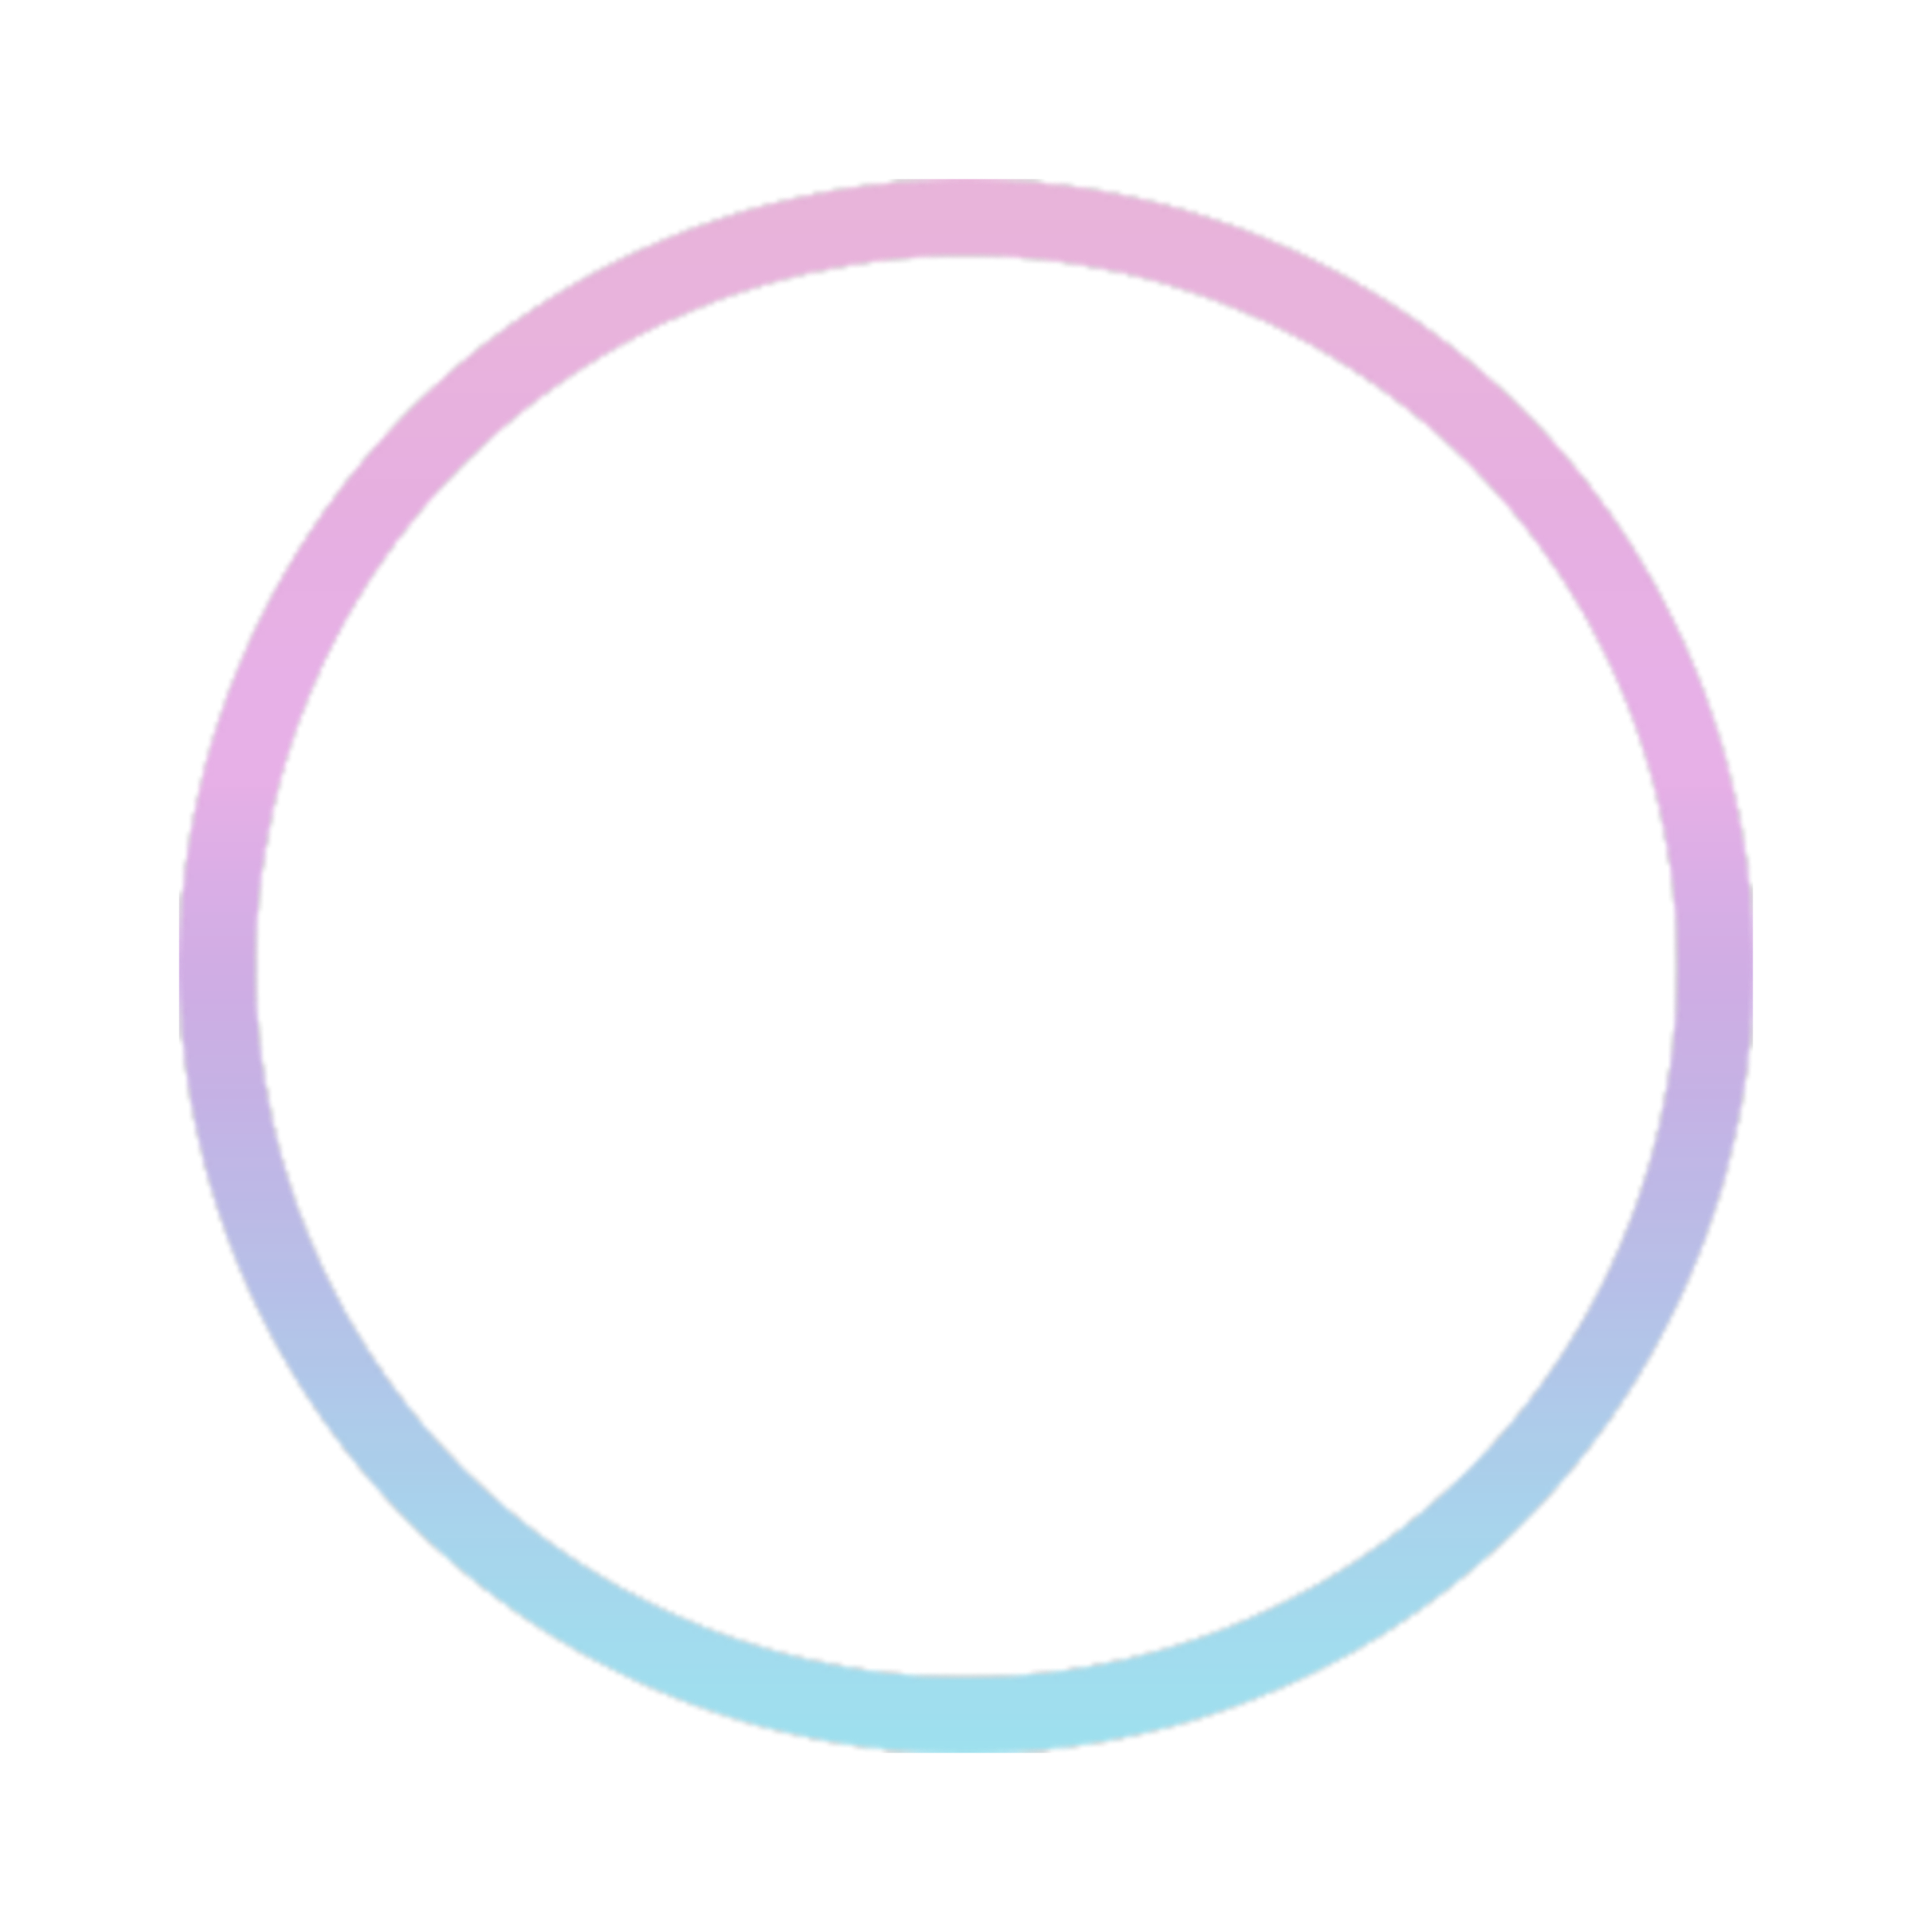 circle outline - Hizir kaptanband co